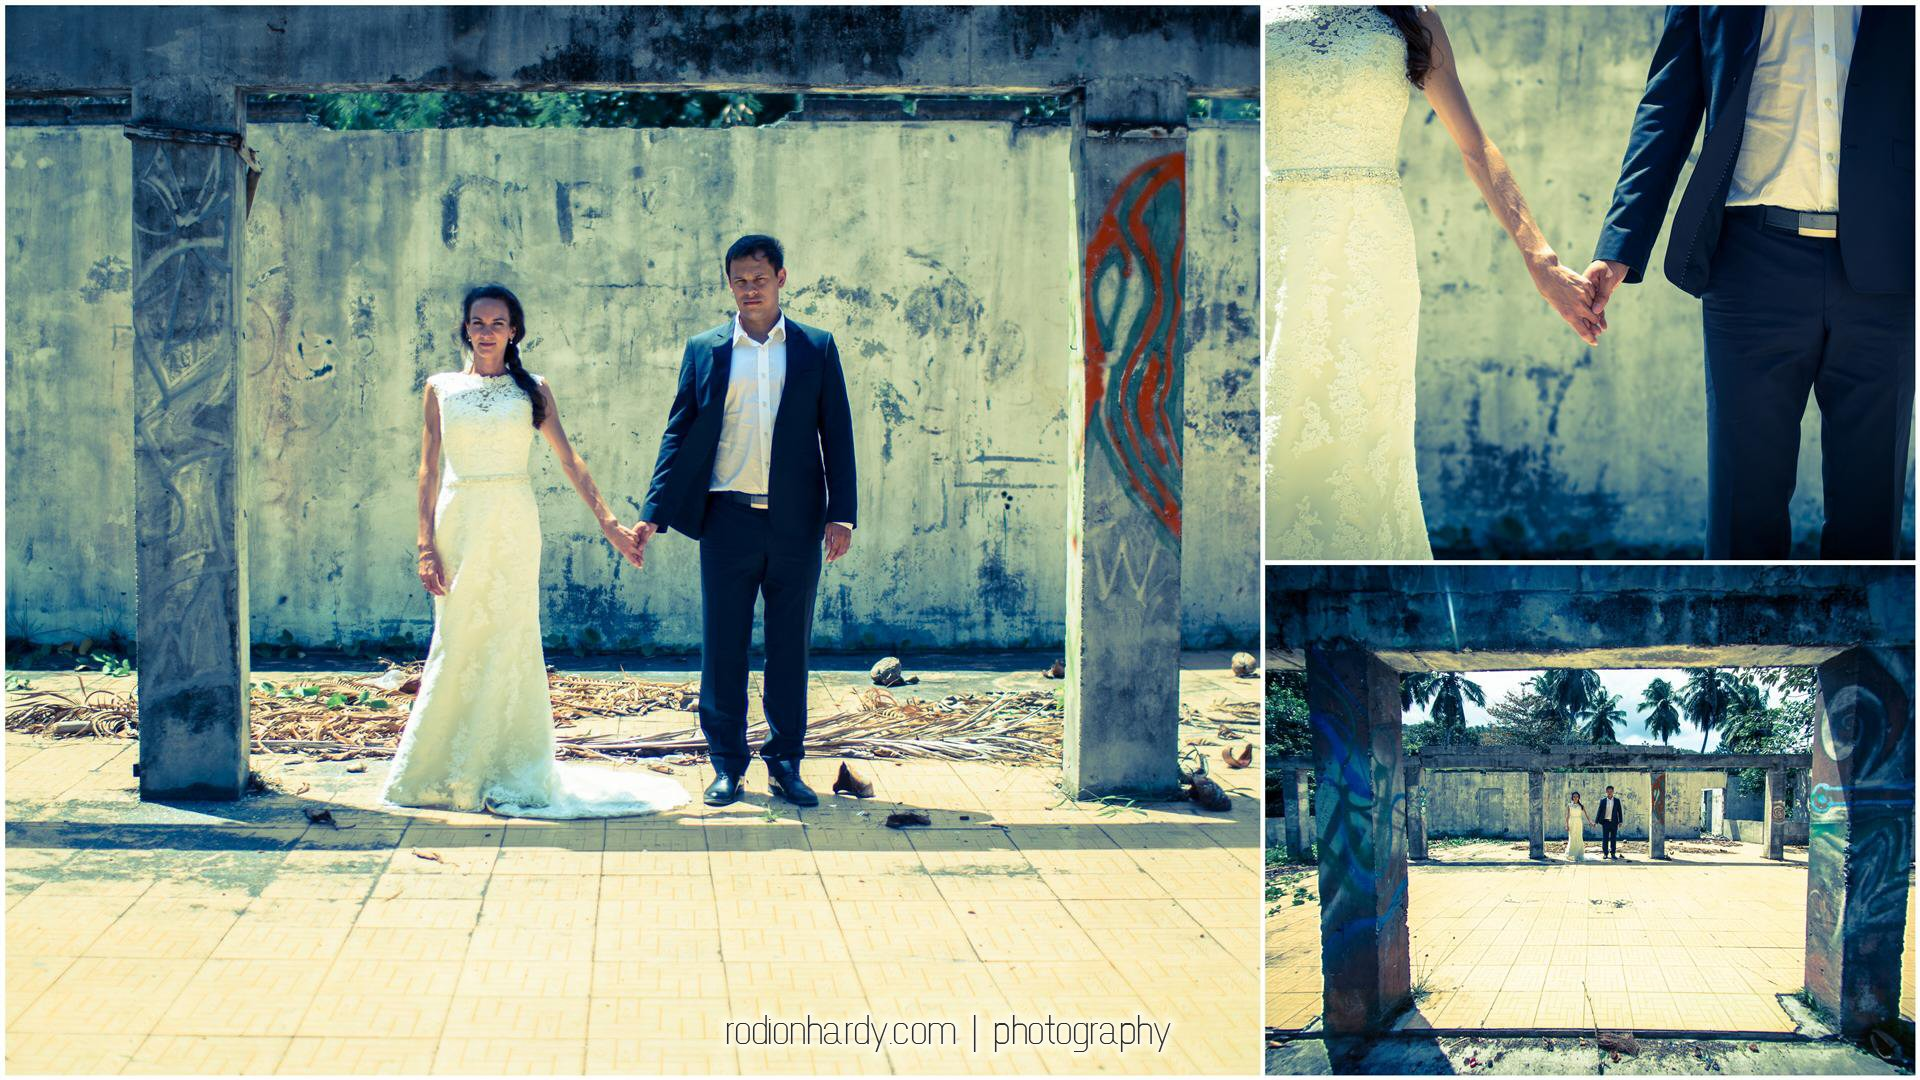 Shooting first wedding